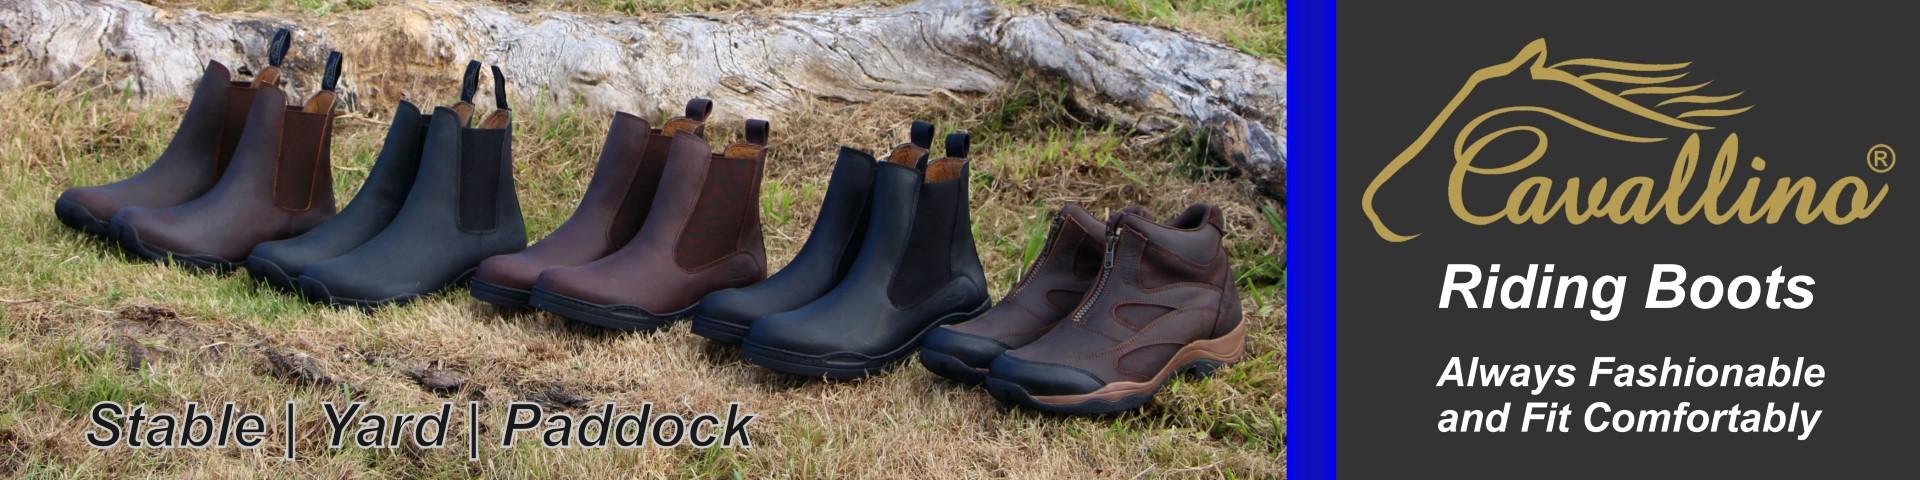 Cavallino Short Boots